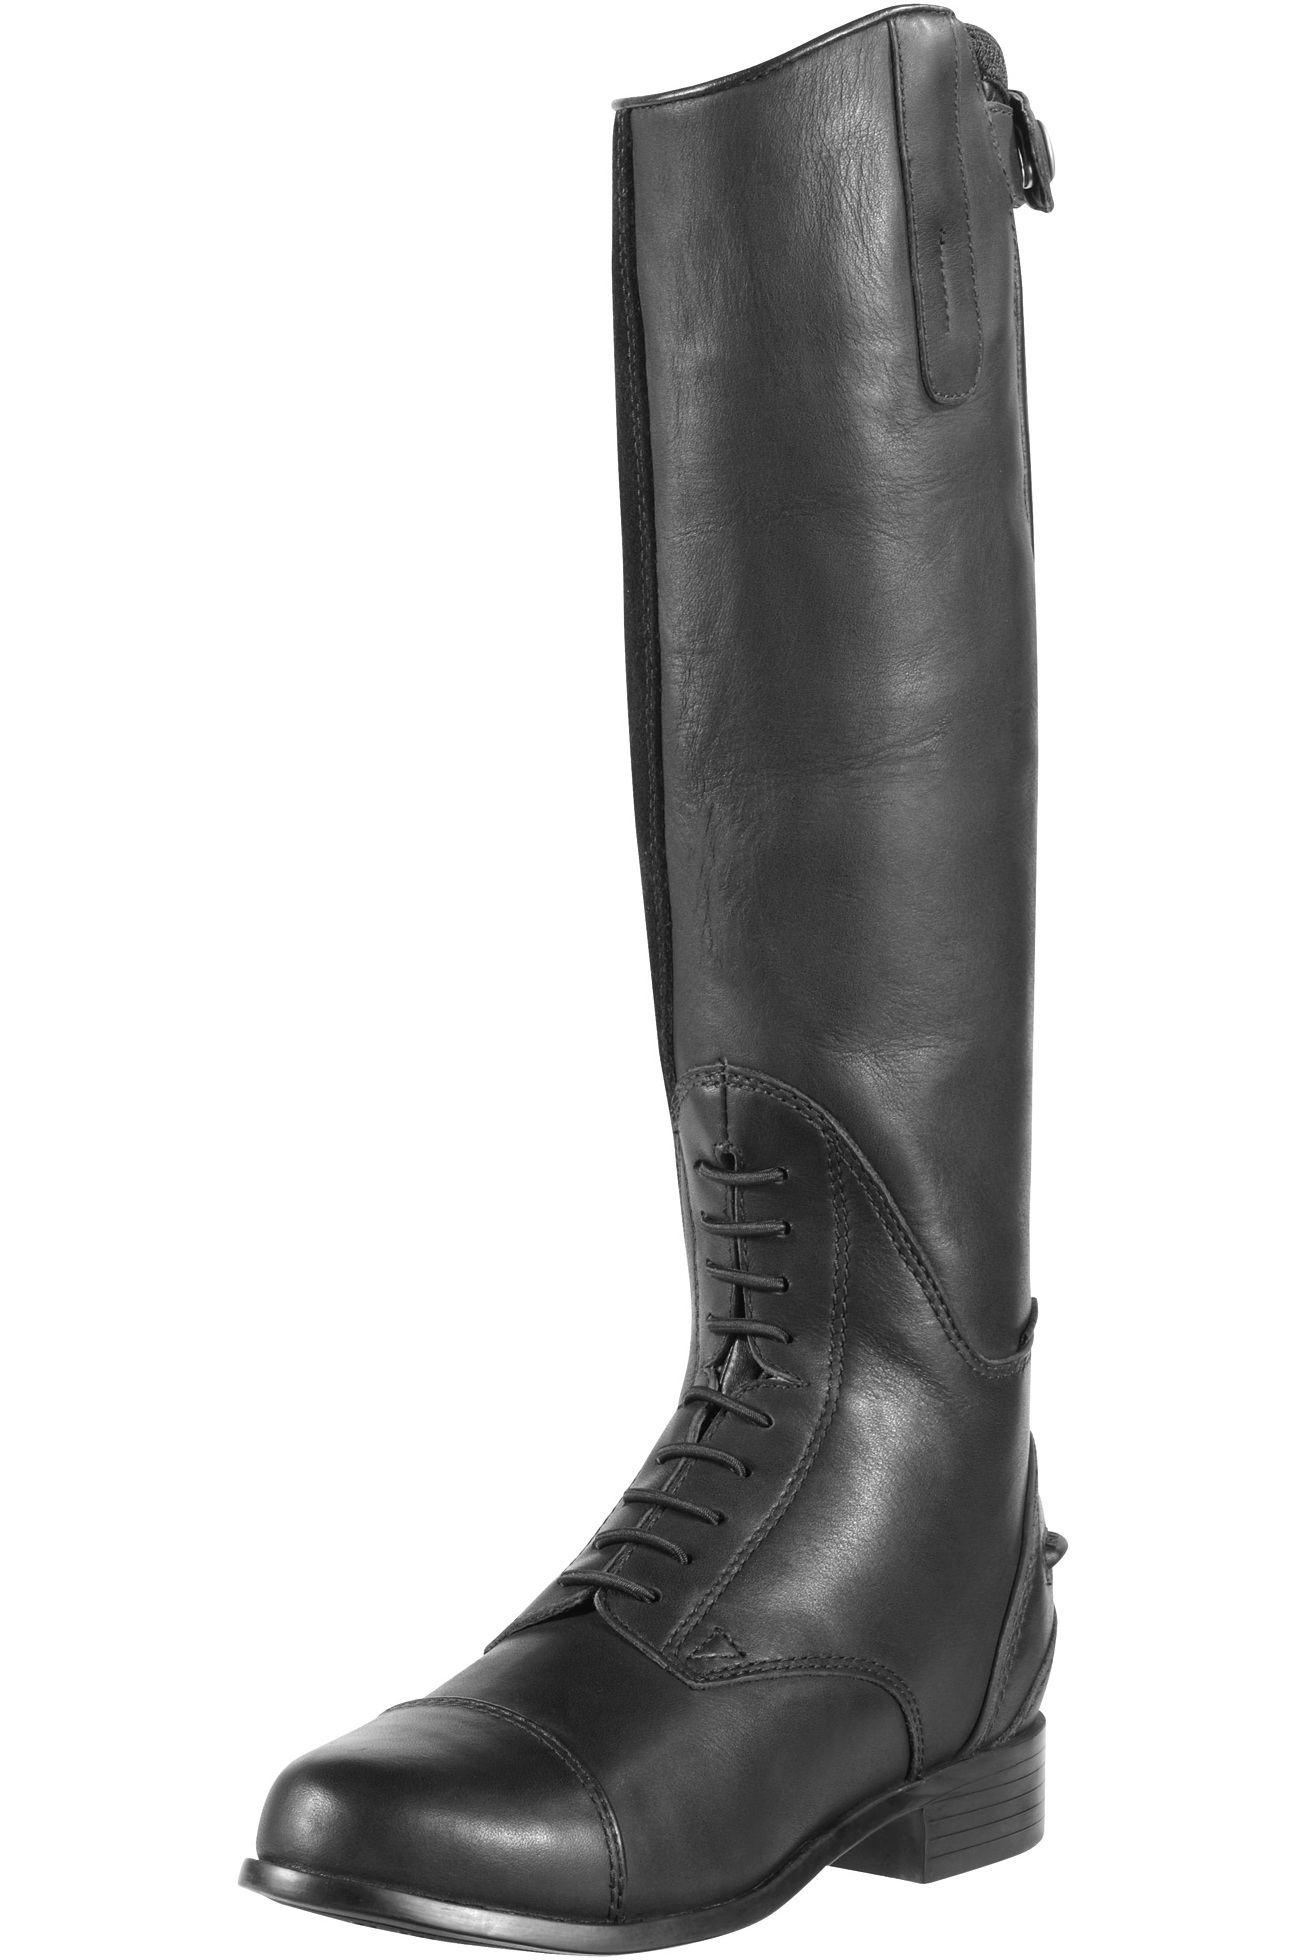 Ariat Yard Boots